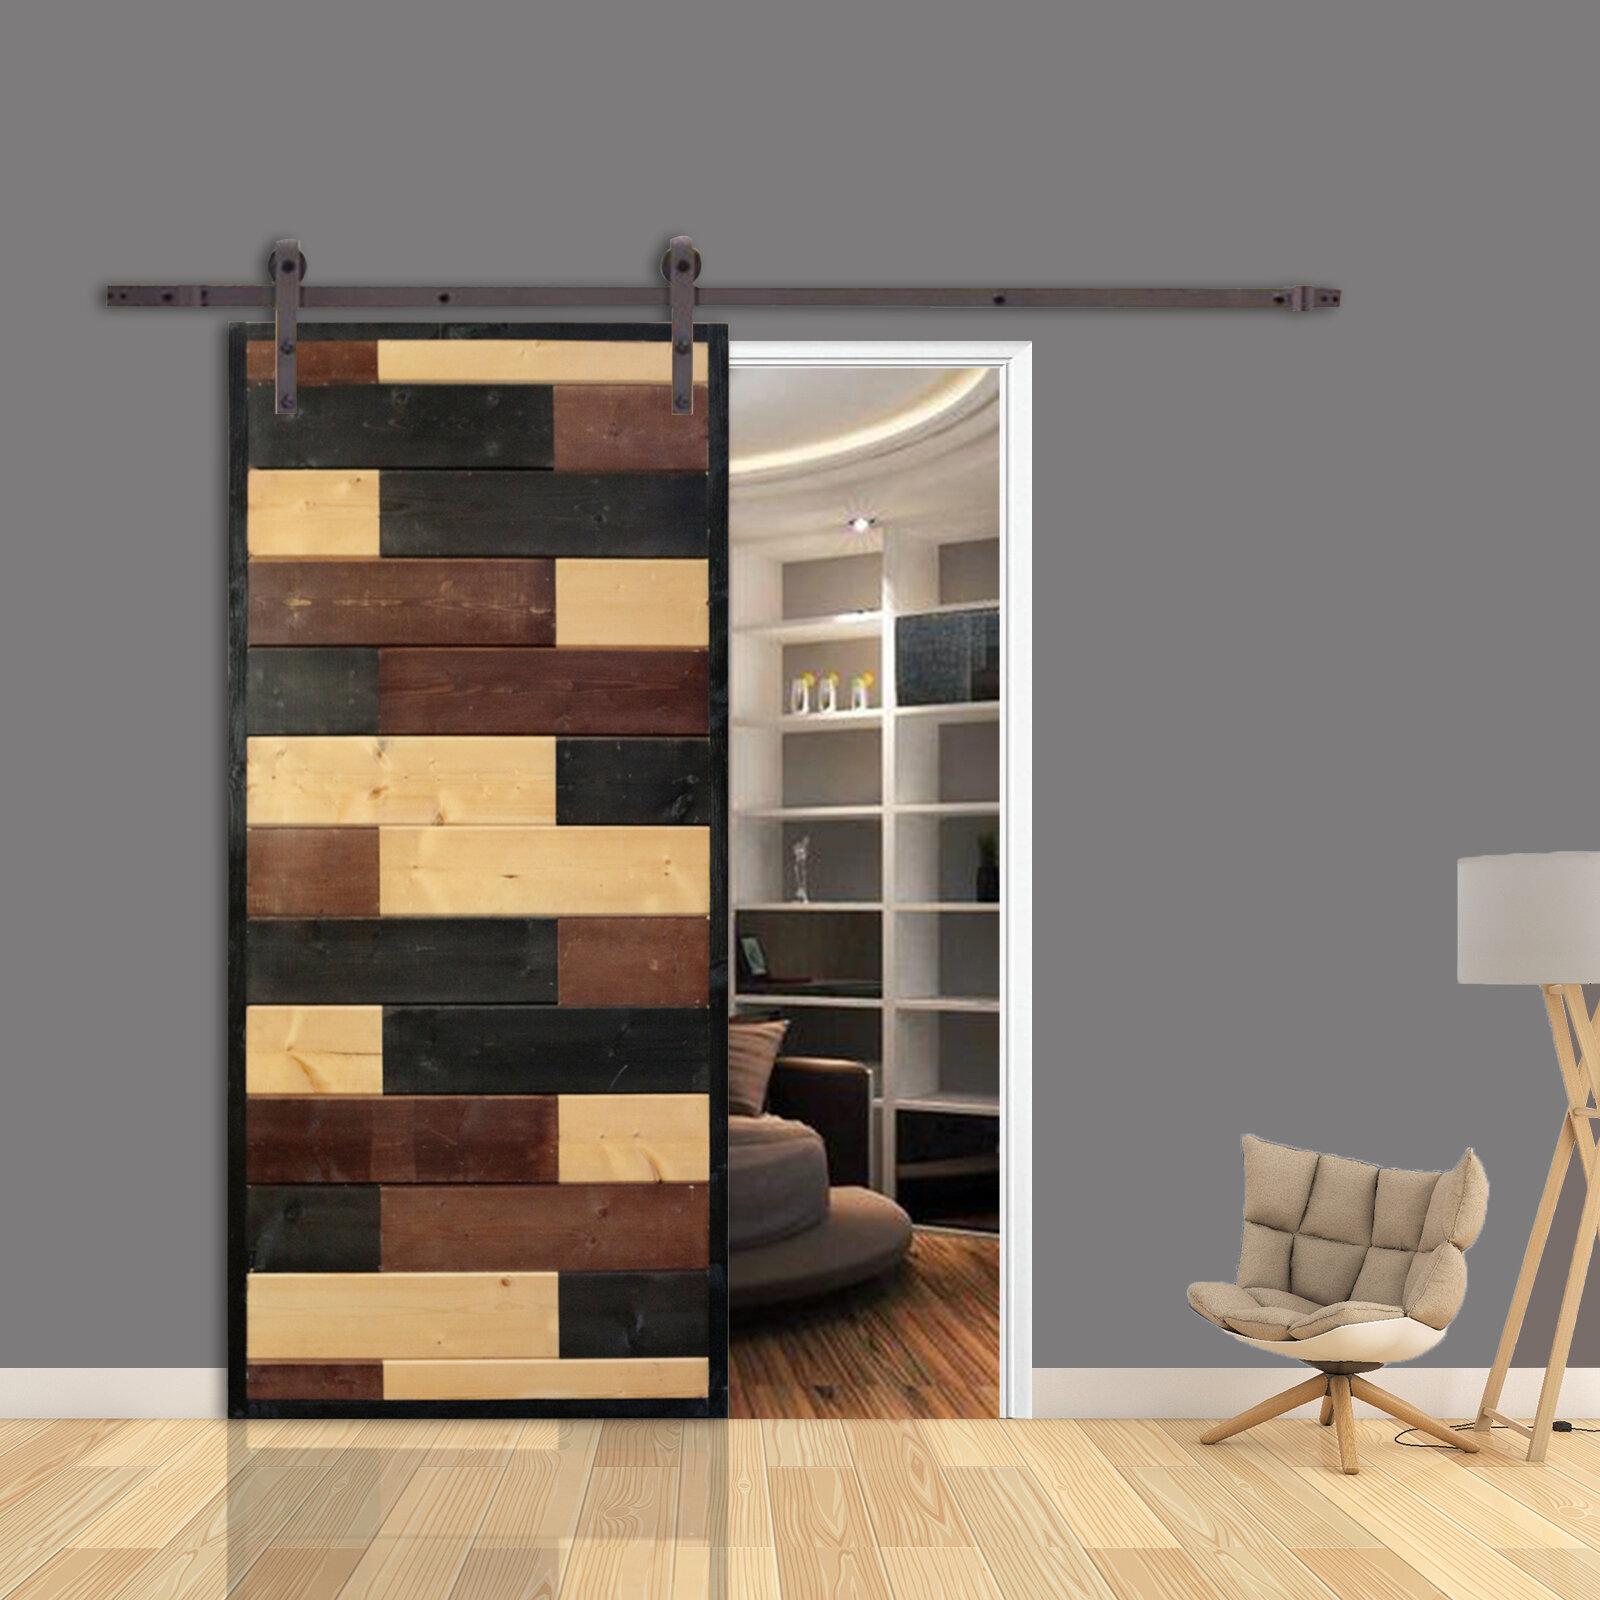 Calhome Mosaic Room Divider Knotty Pine Wood Slab Interior Barn Door Wayfair